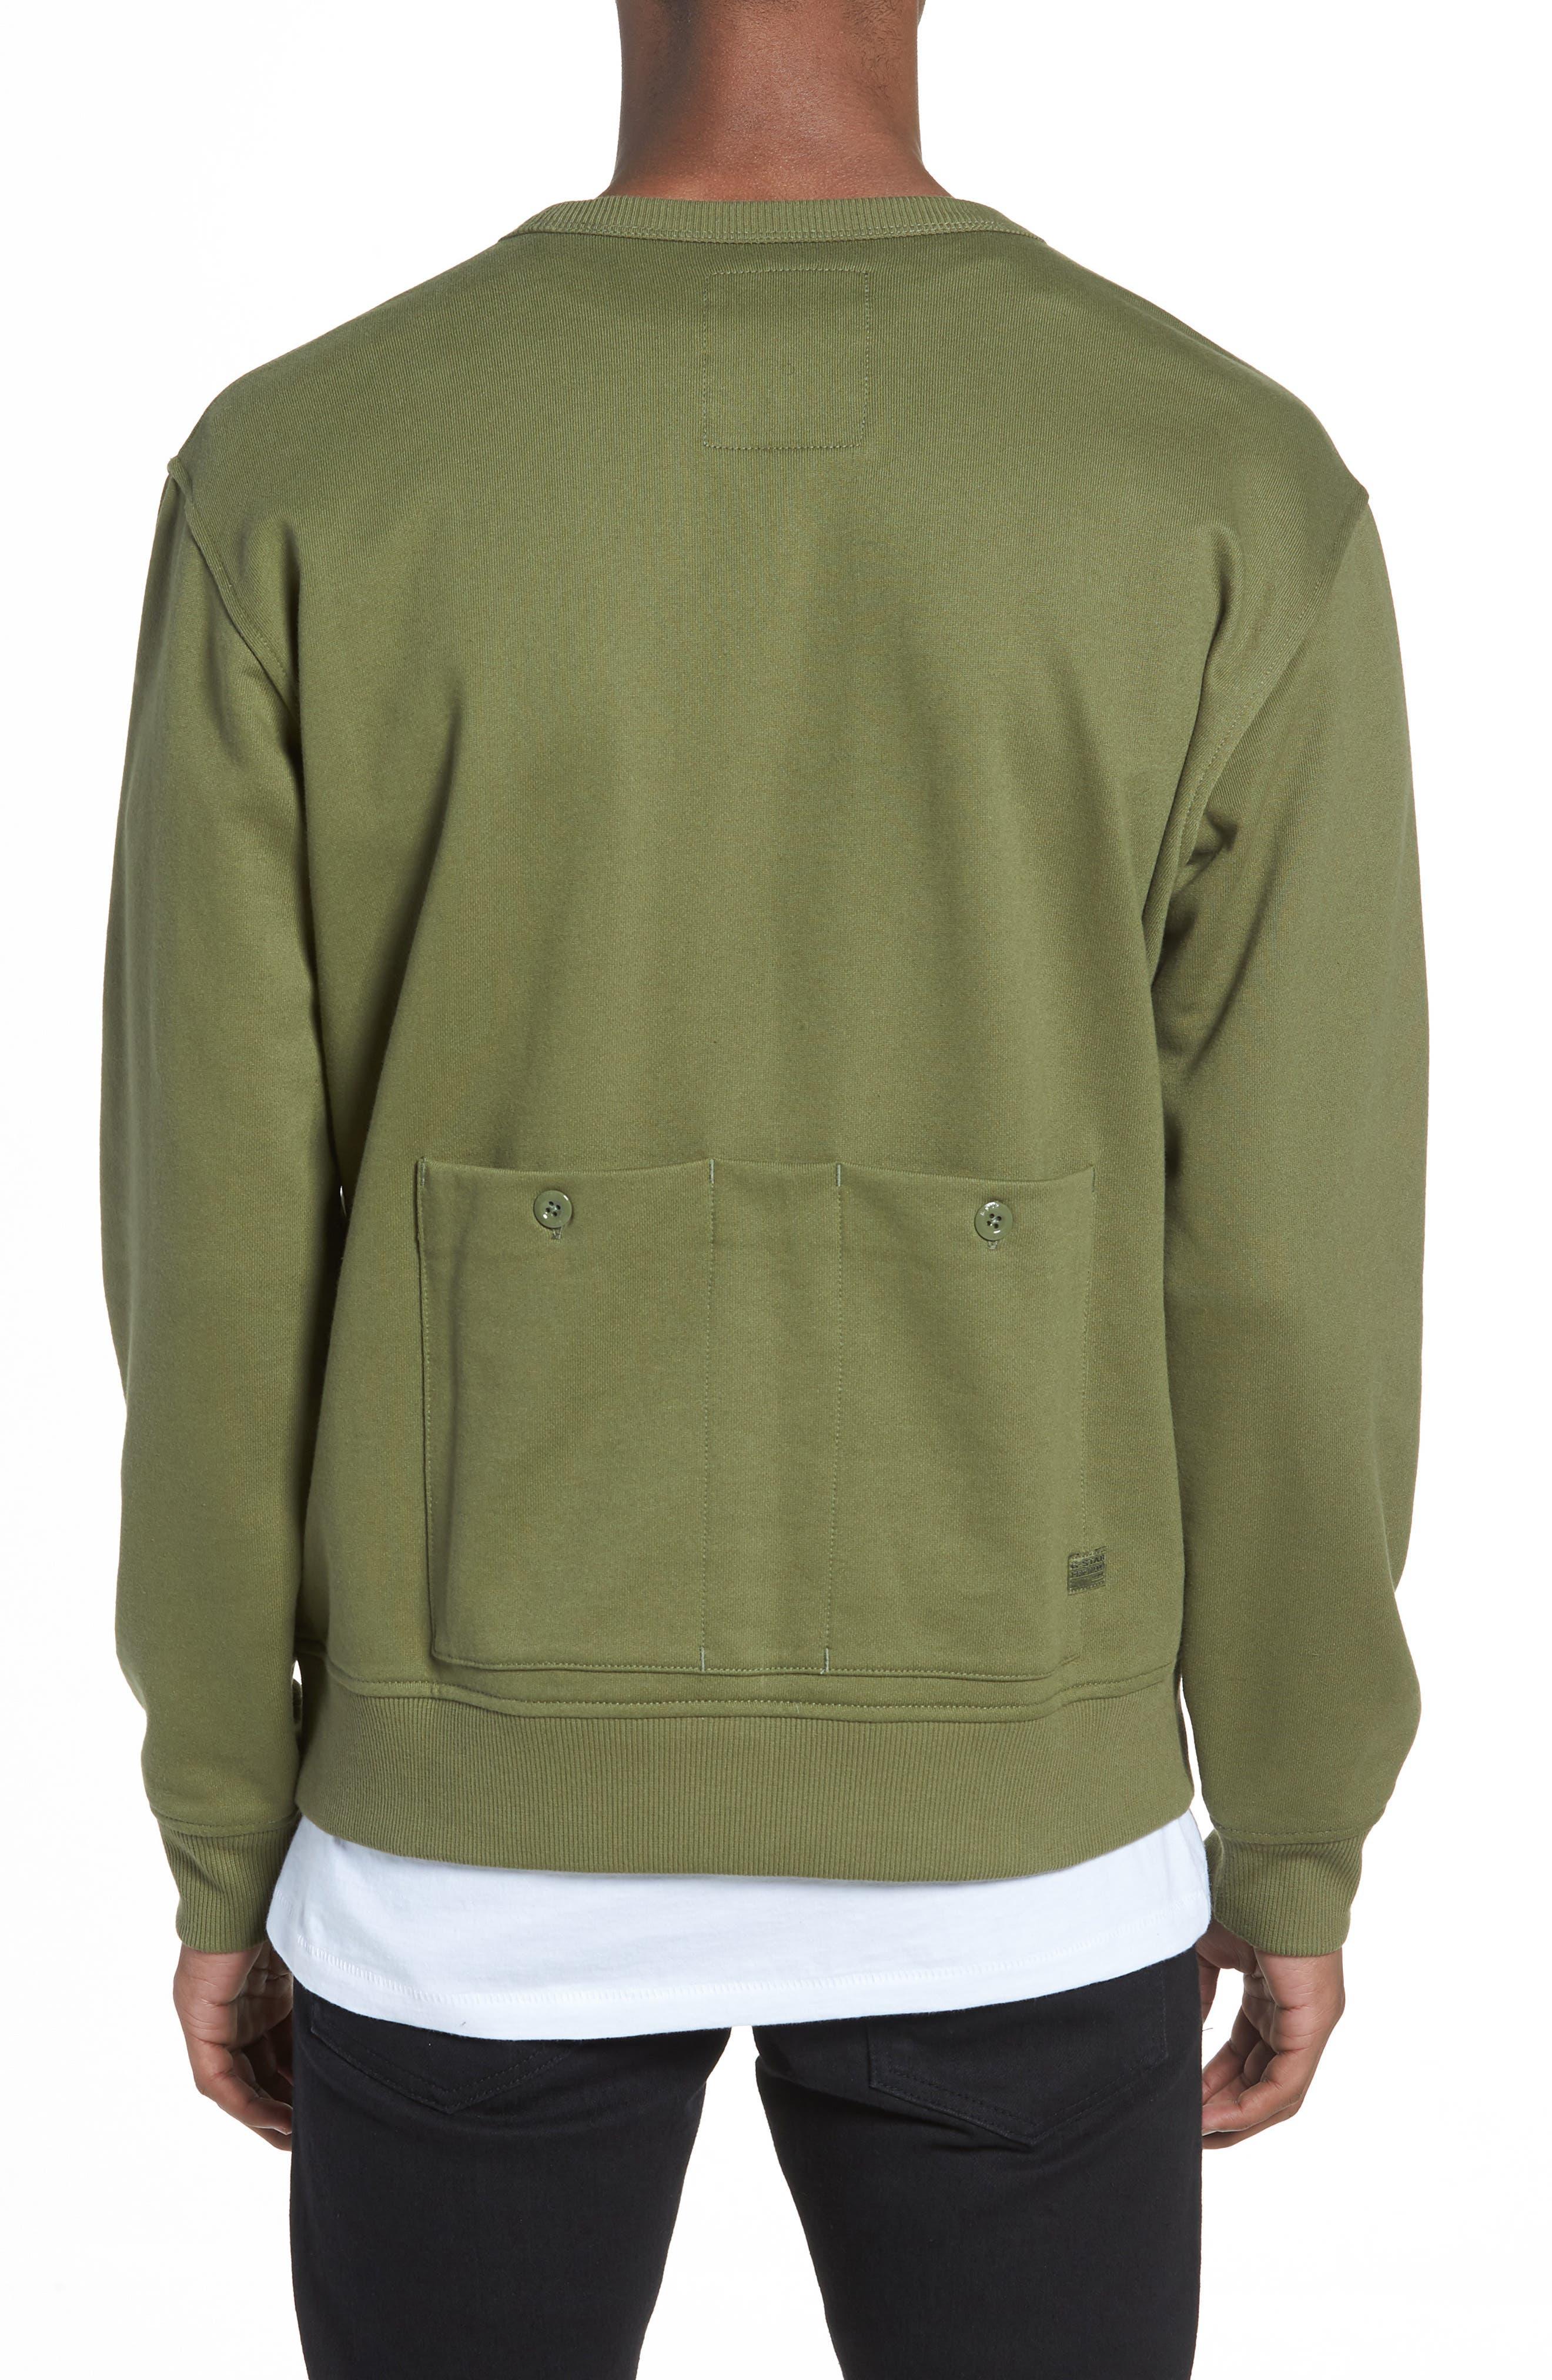 G-STAR RAW,                             Core Hybrid Archive Sweatshirt,                             Alternate thumbnail 2, color,                             300